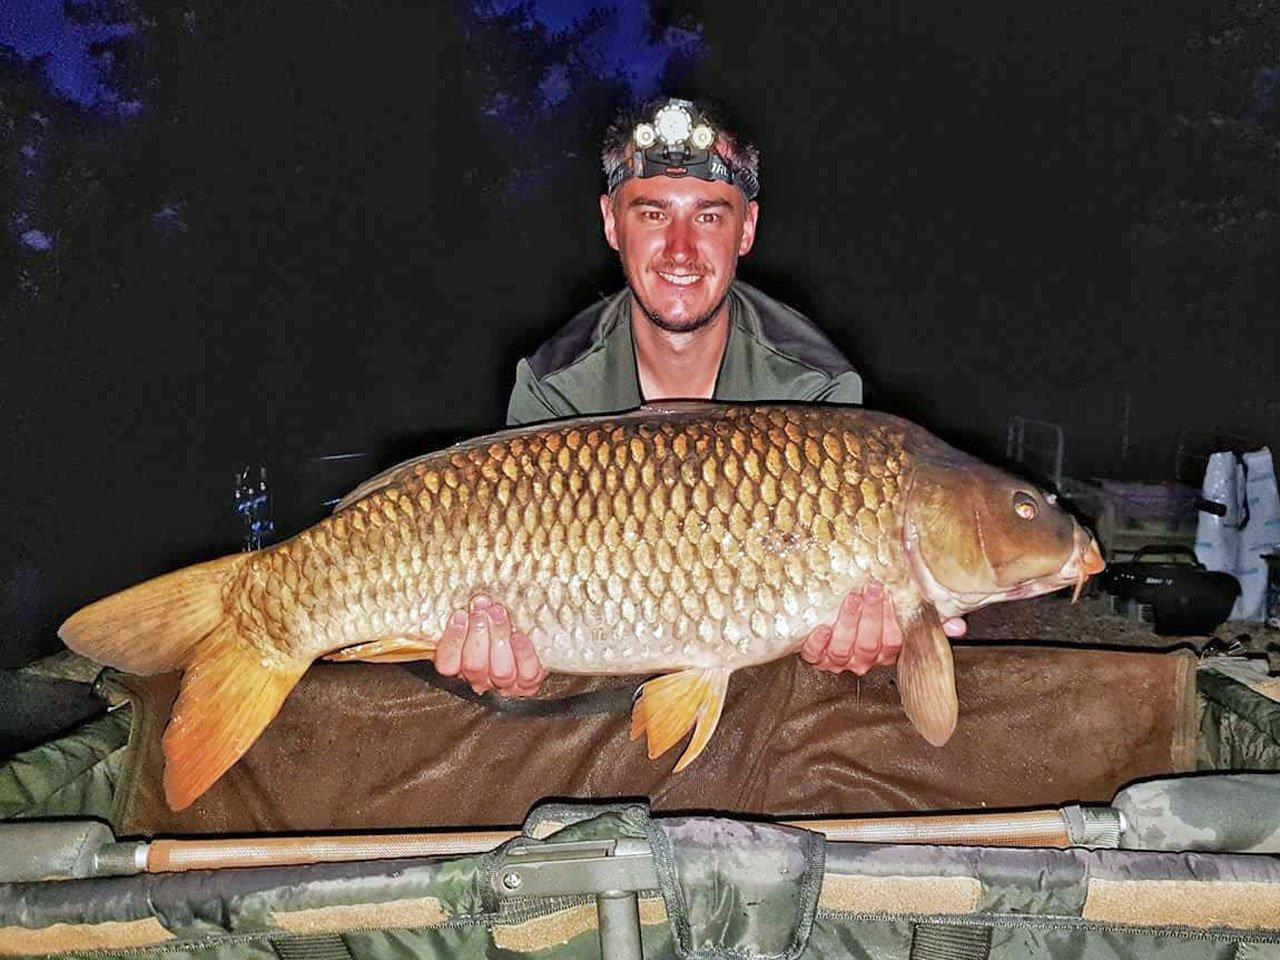 Luke with a 26lb common carp